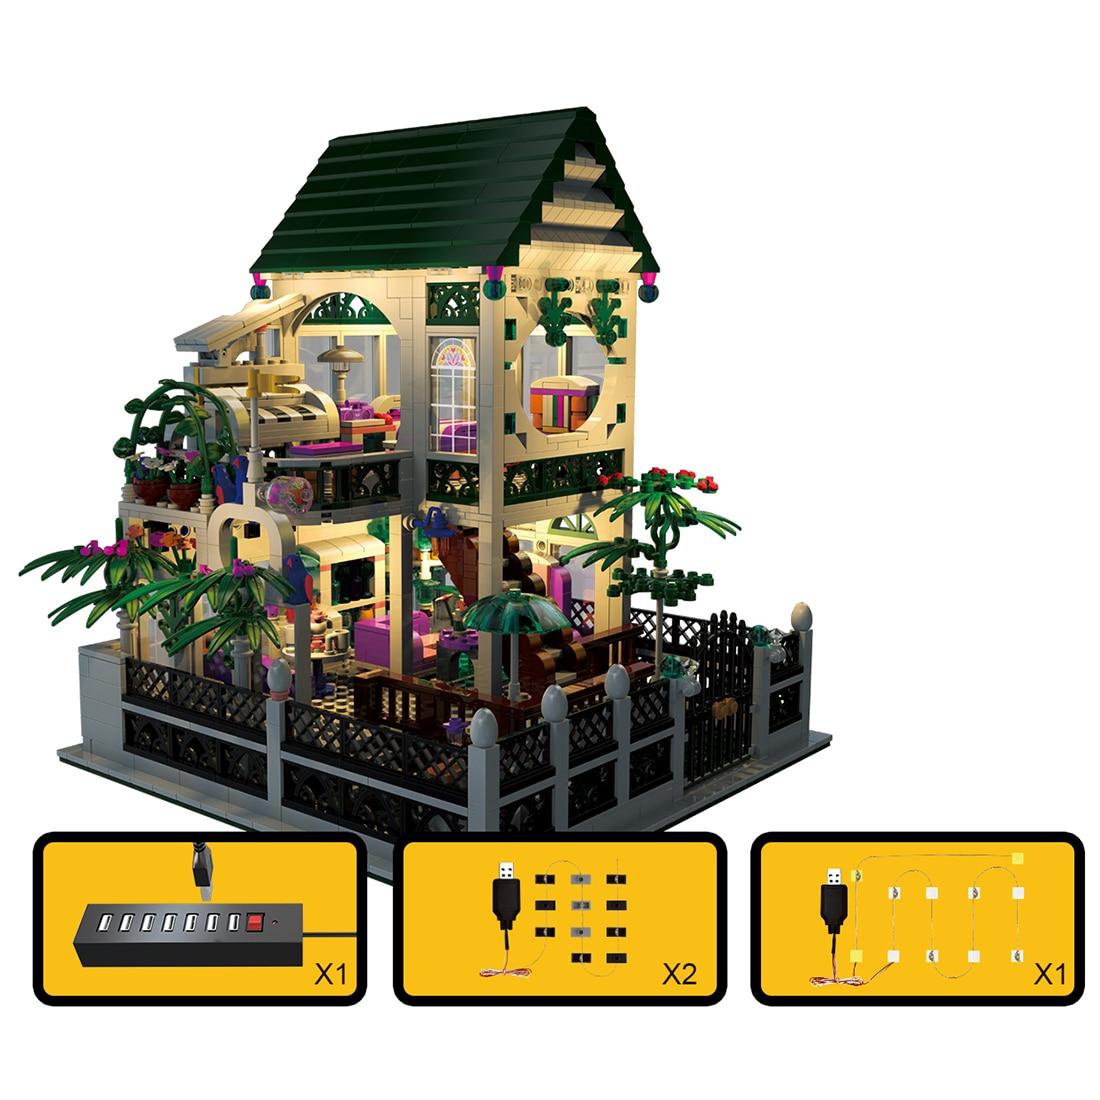 MOC City Series Toy 1500Pcs DIY Romantic Cottage Kits Dollhouse Building Blocks House Model With Light Educational Kits For 8+